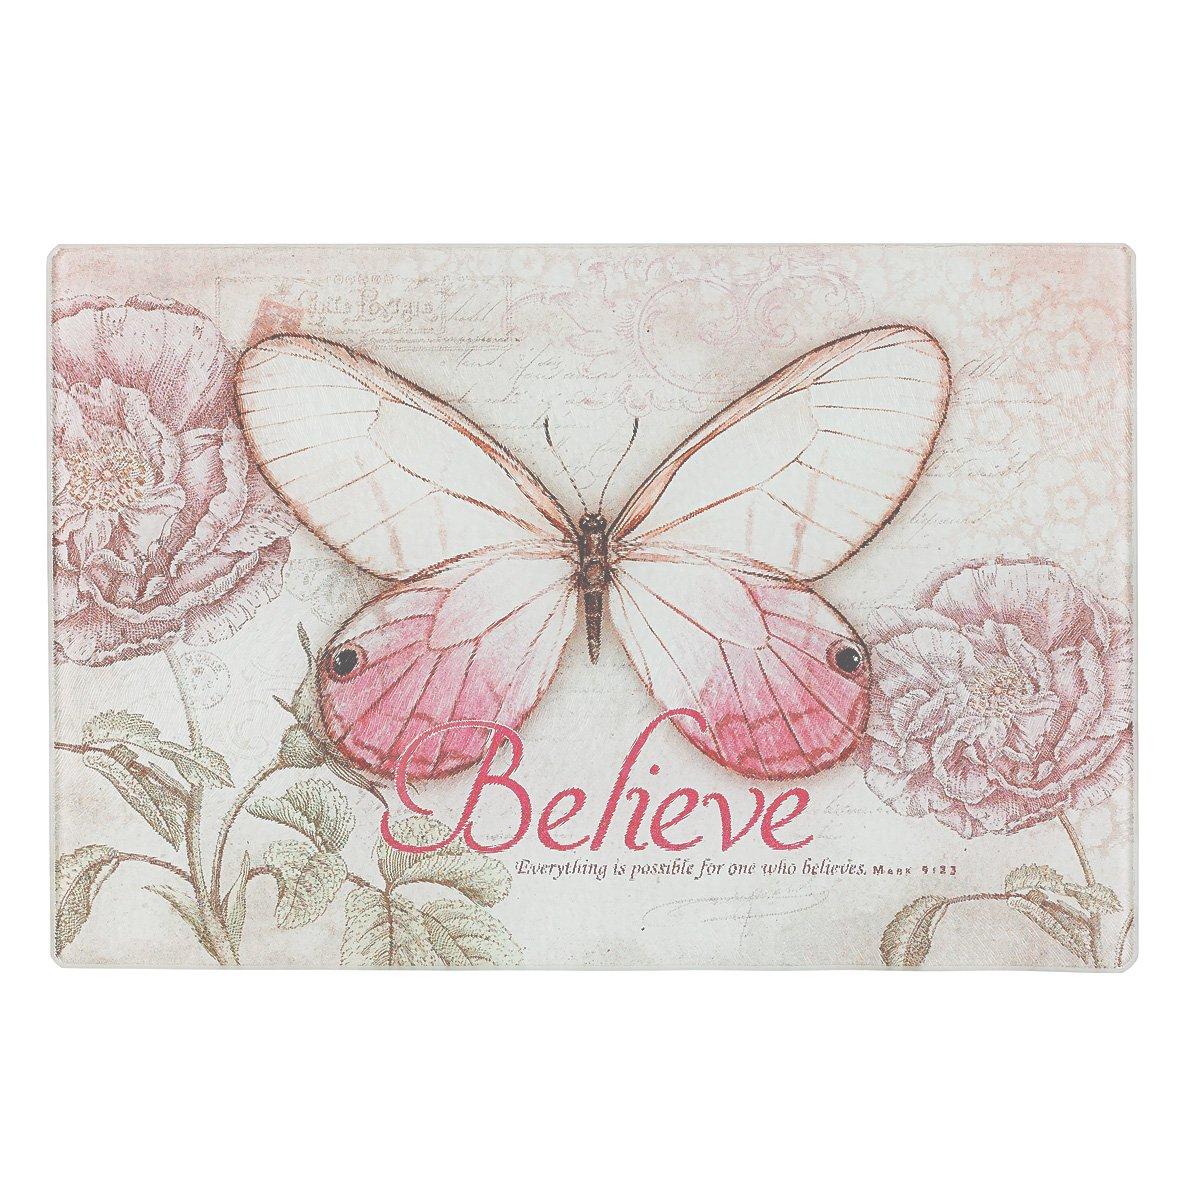 Botanic Butterfly Blessings''Believe'' Glass Cutting Board/Trivet - Mark 9:23 (Small: 11 7/8 x 7 7/8)